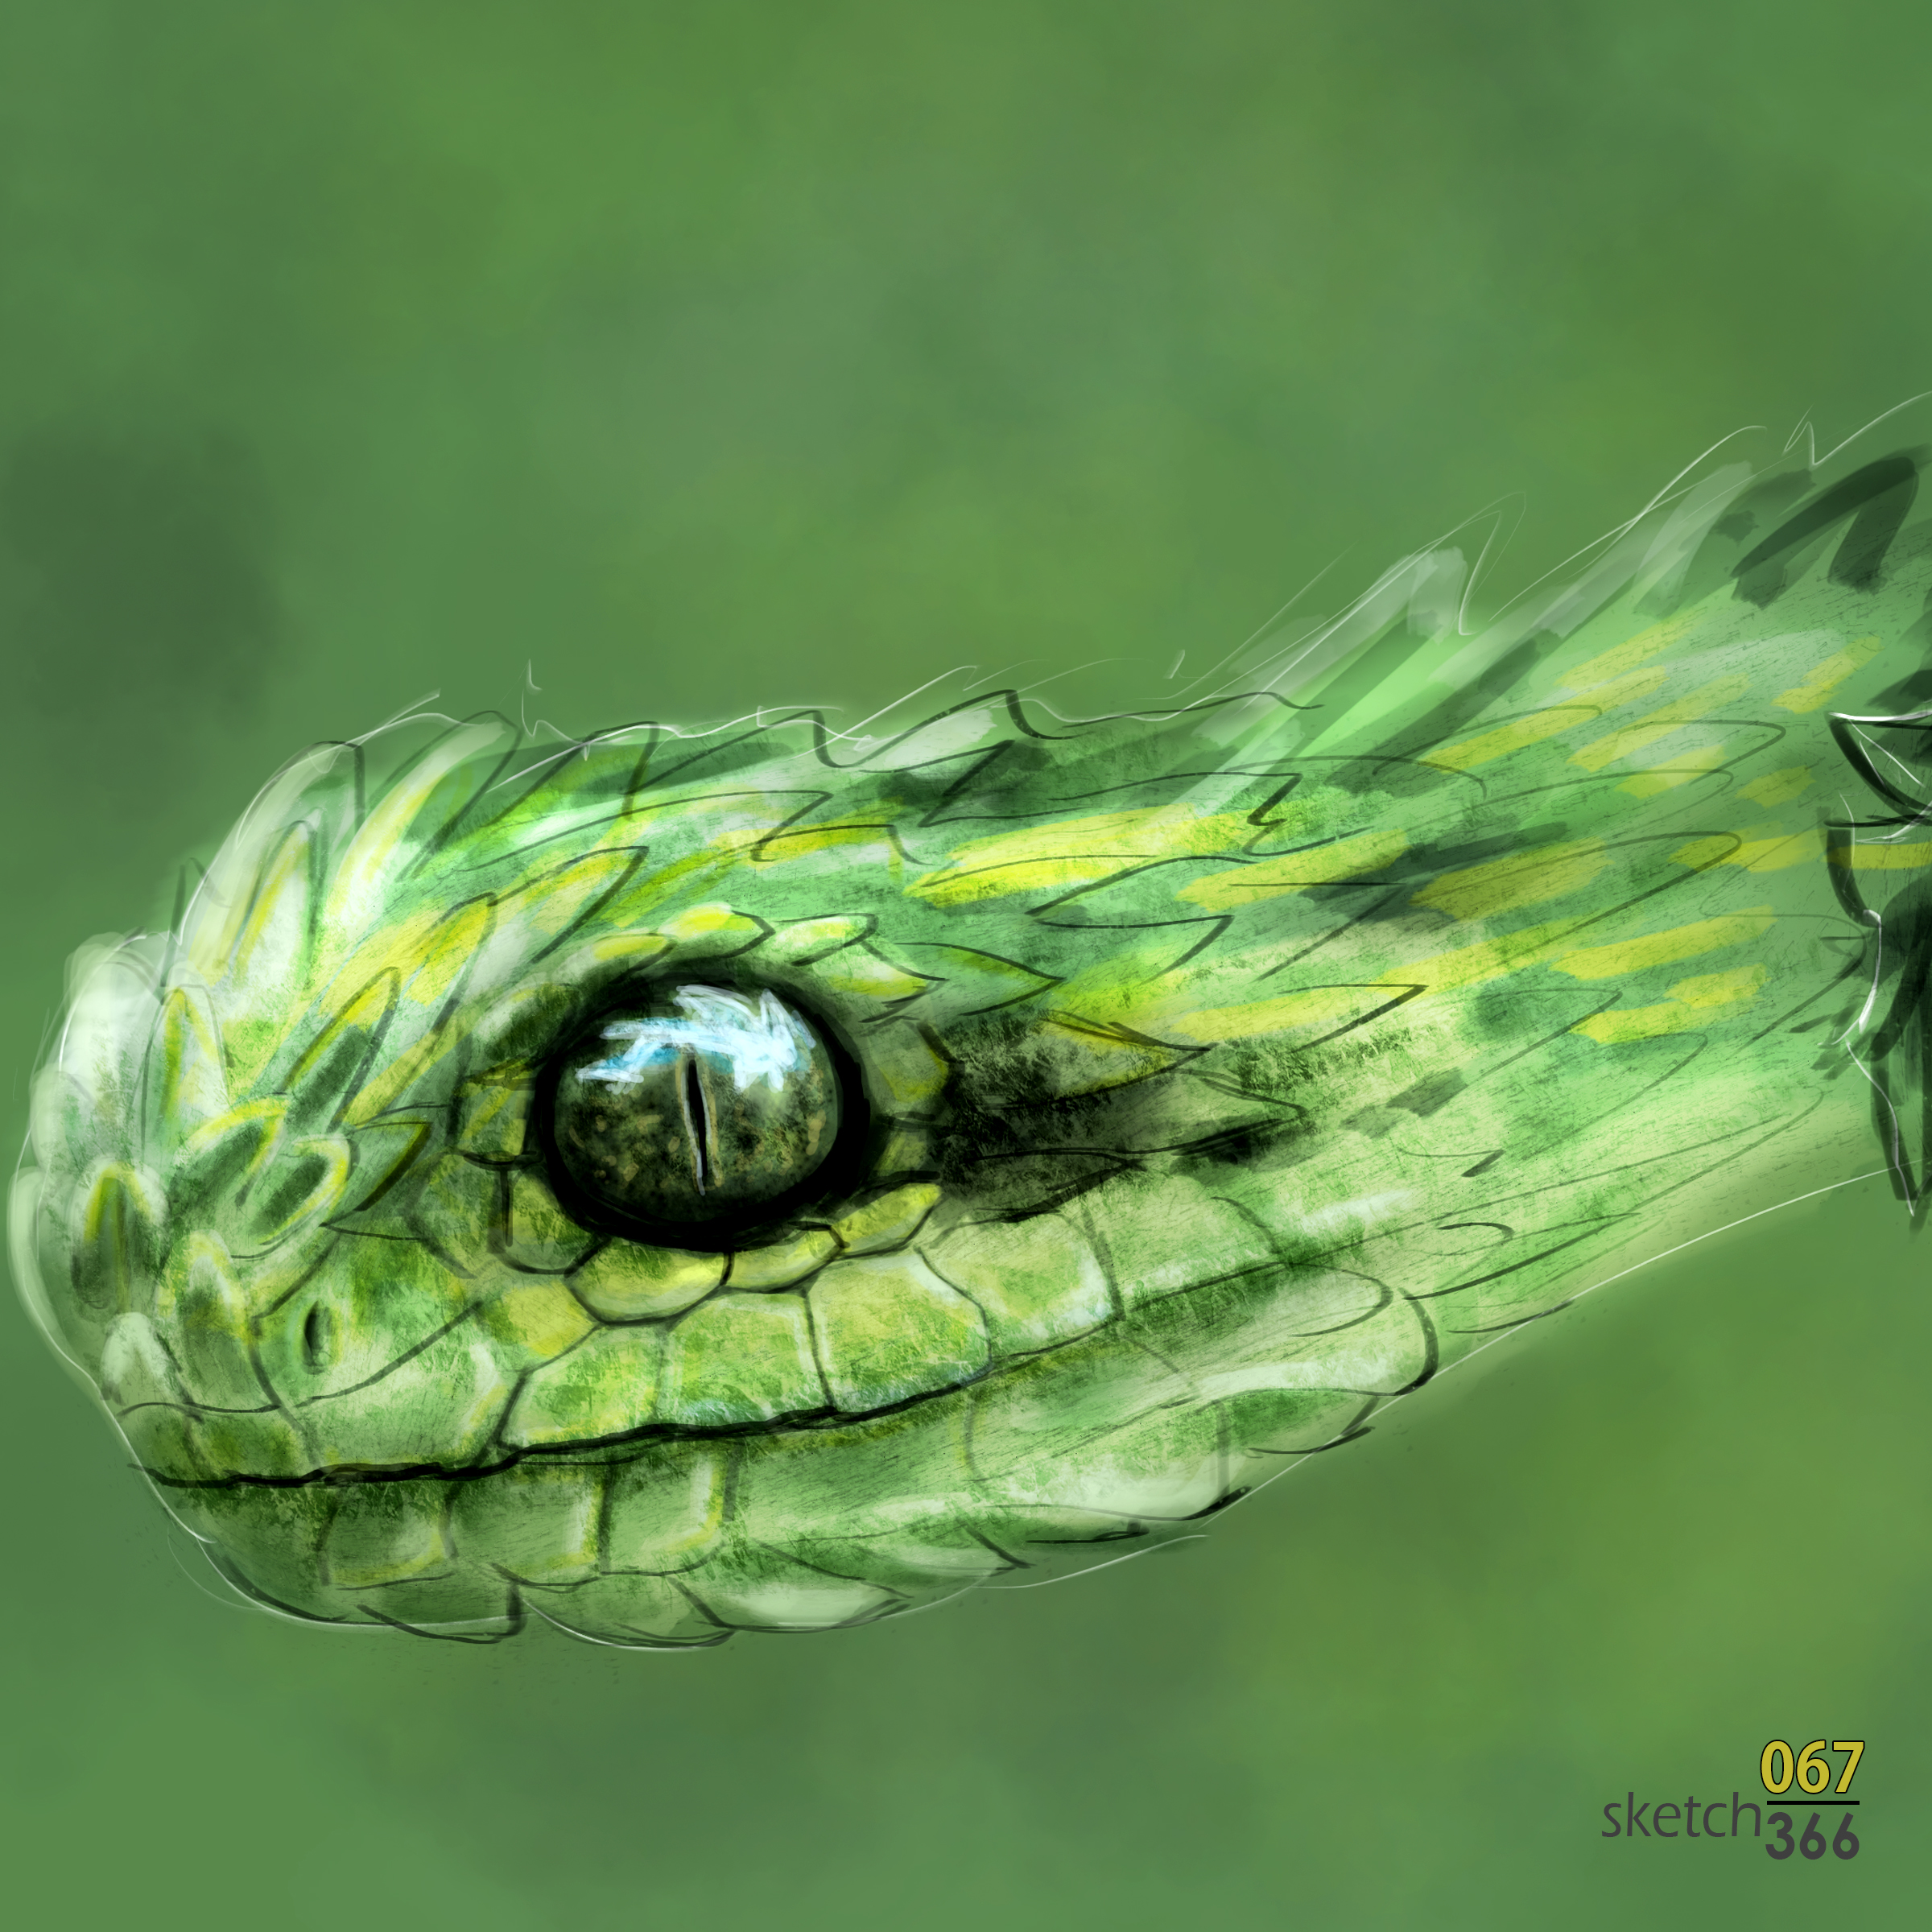 bush viper snake - digital paint